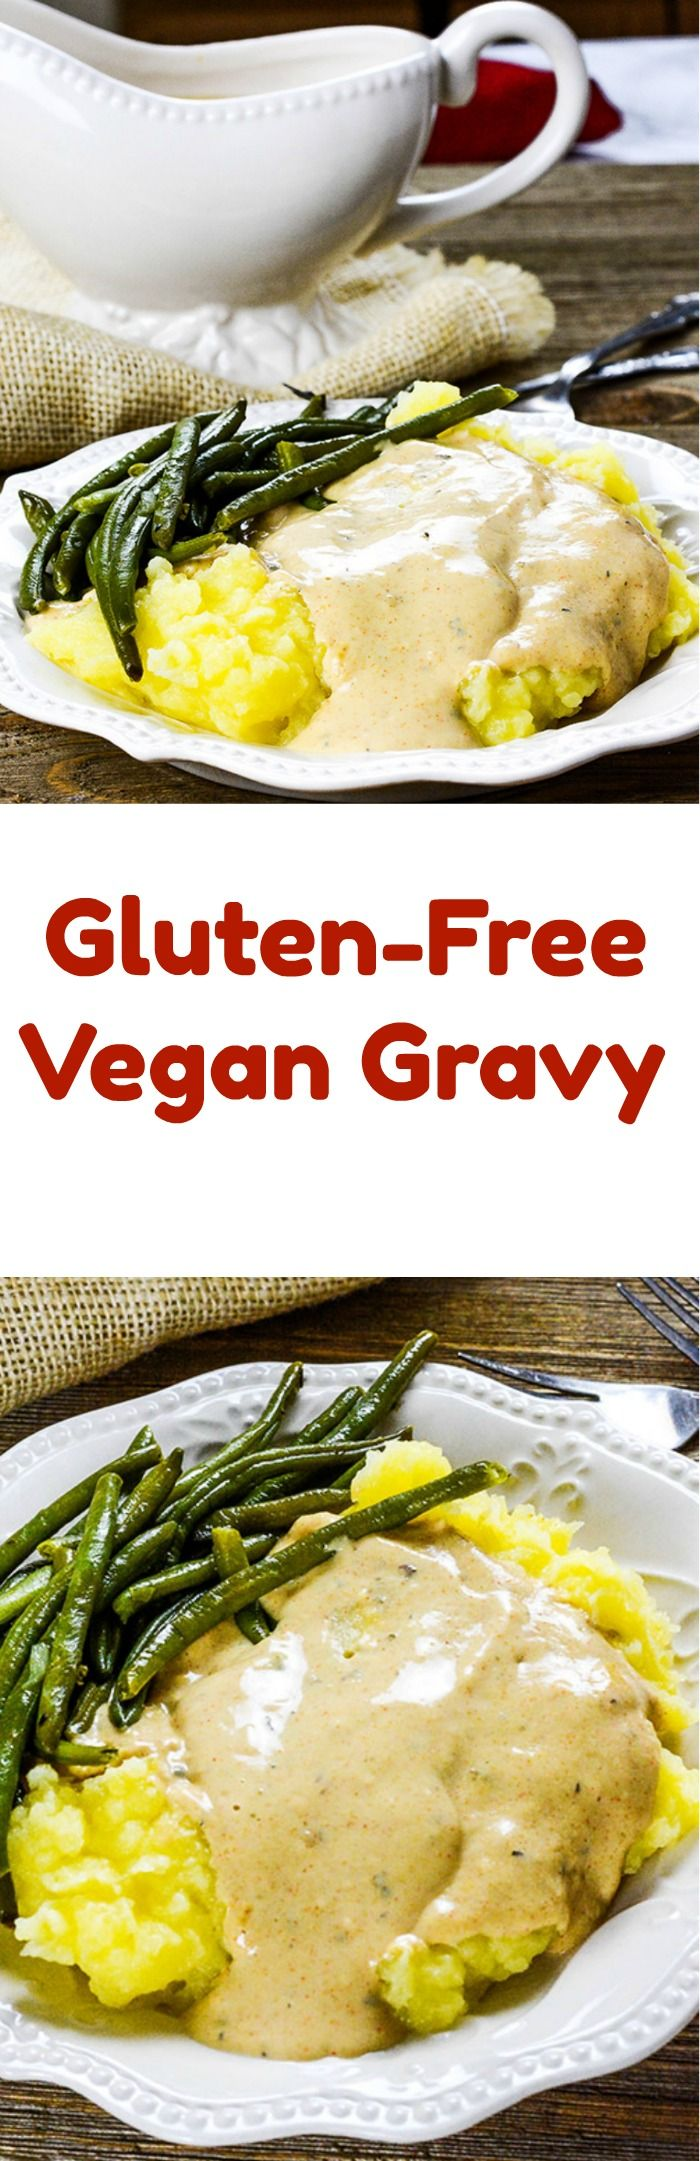 Gluten-Free, Vegan Gravy